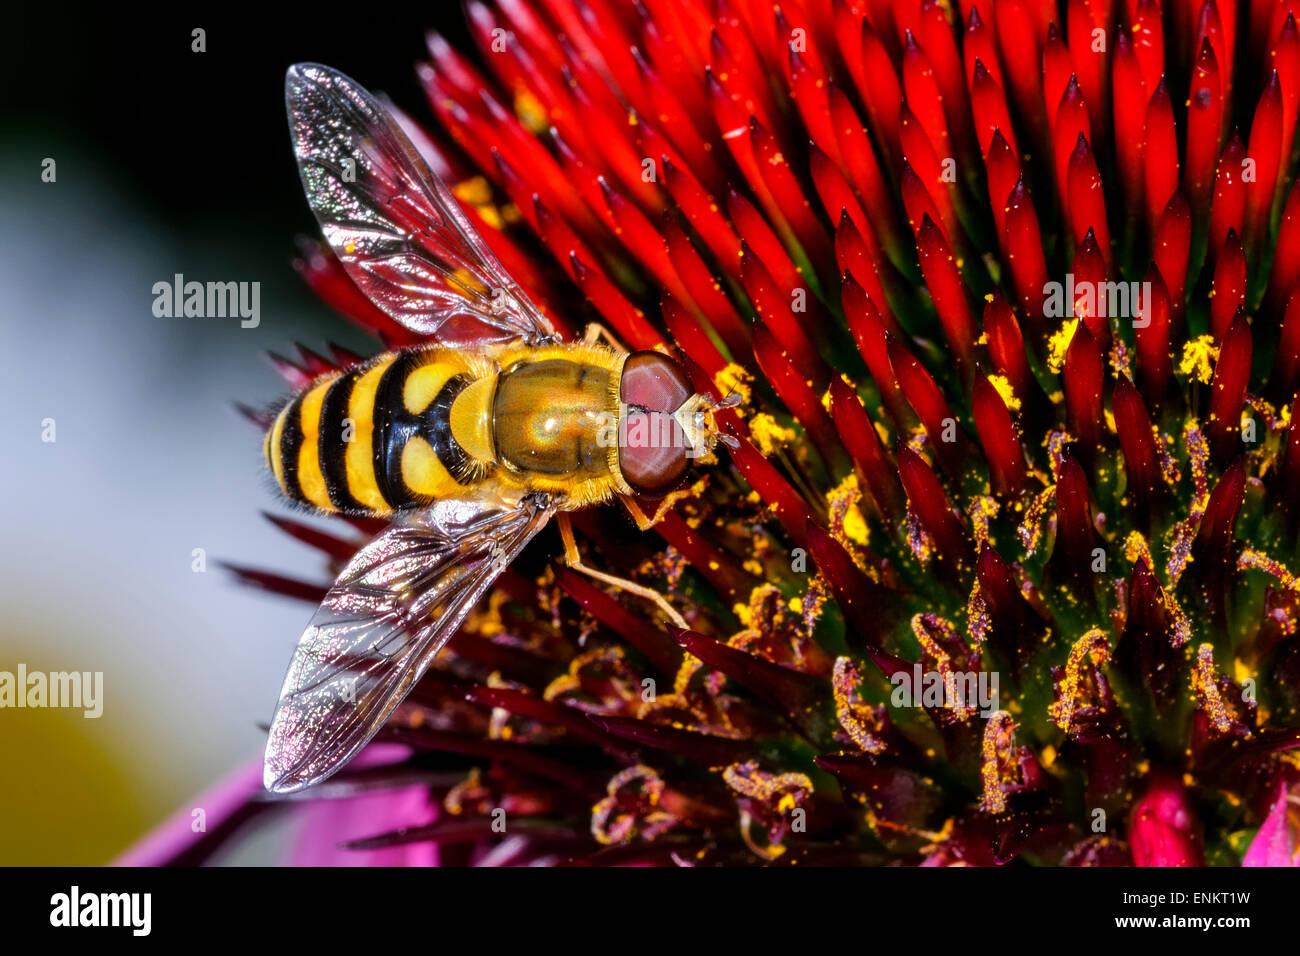 syrphus torvus - Stock Image